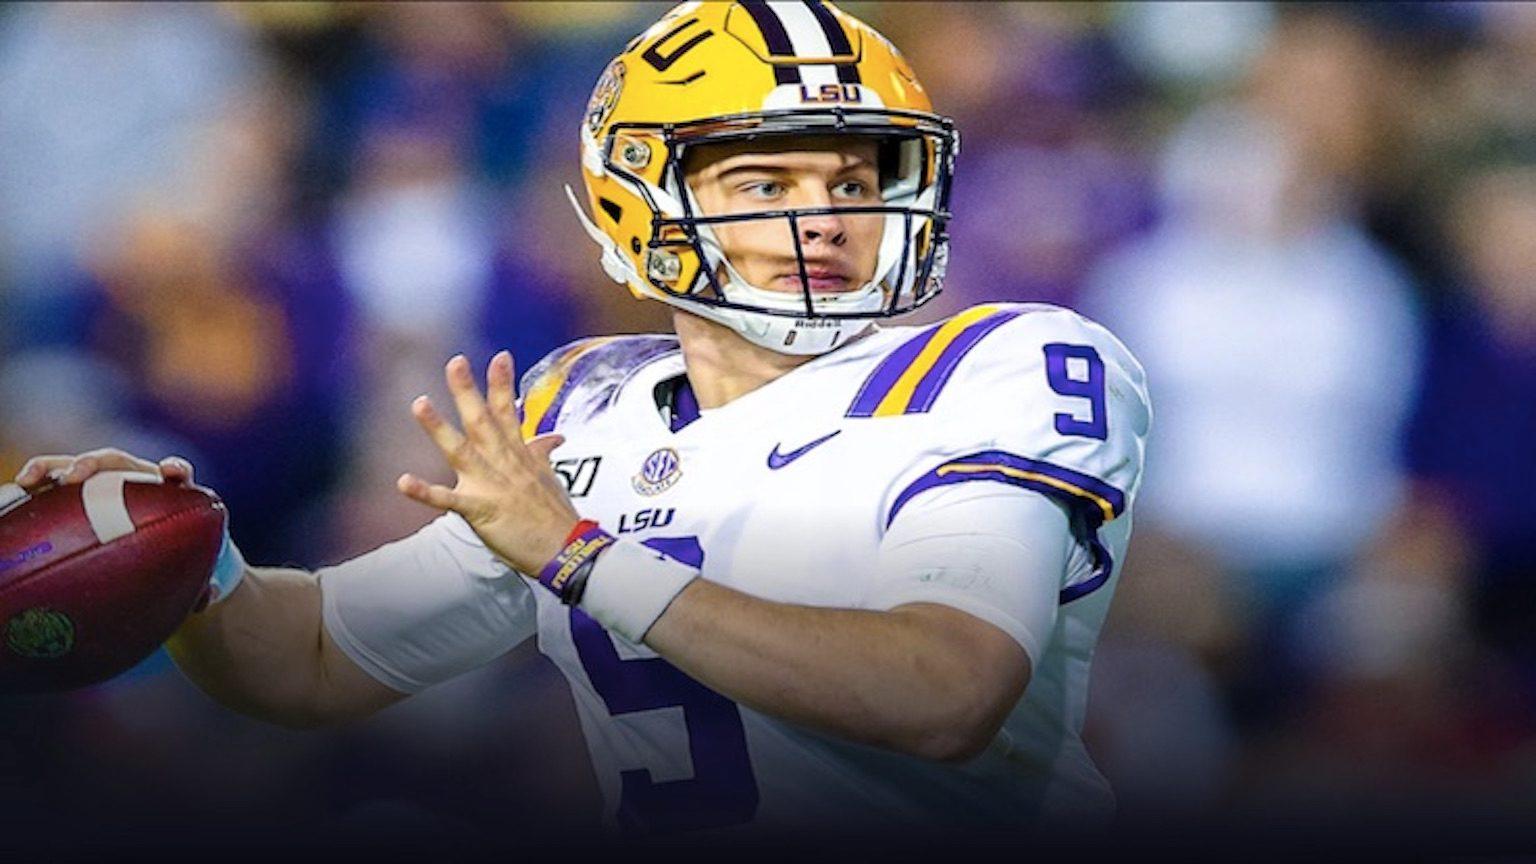 Joe Burrow, quarterback of LSU, throwing a football.